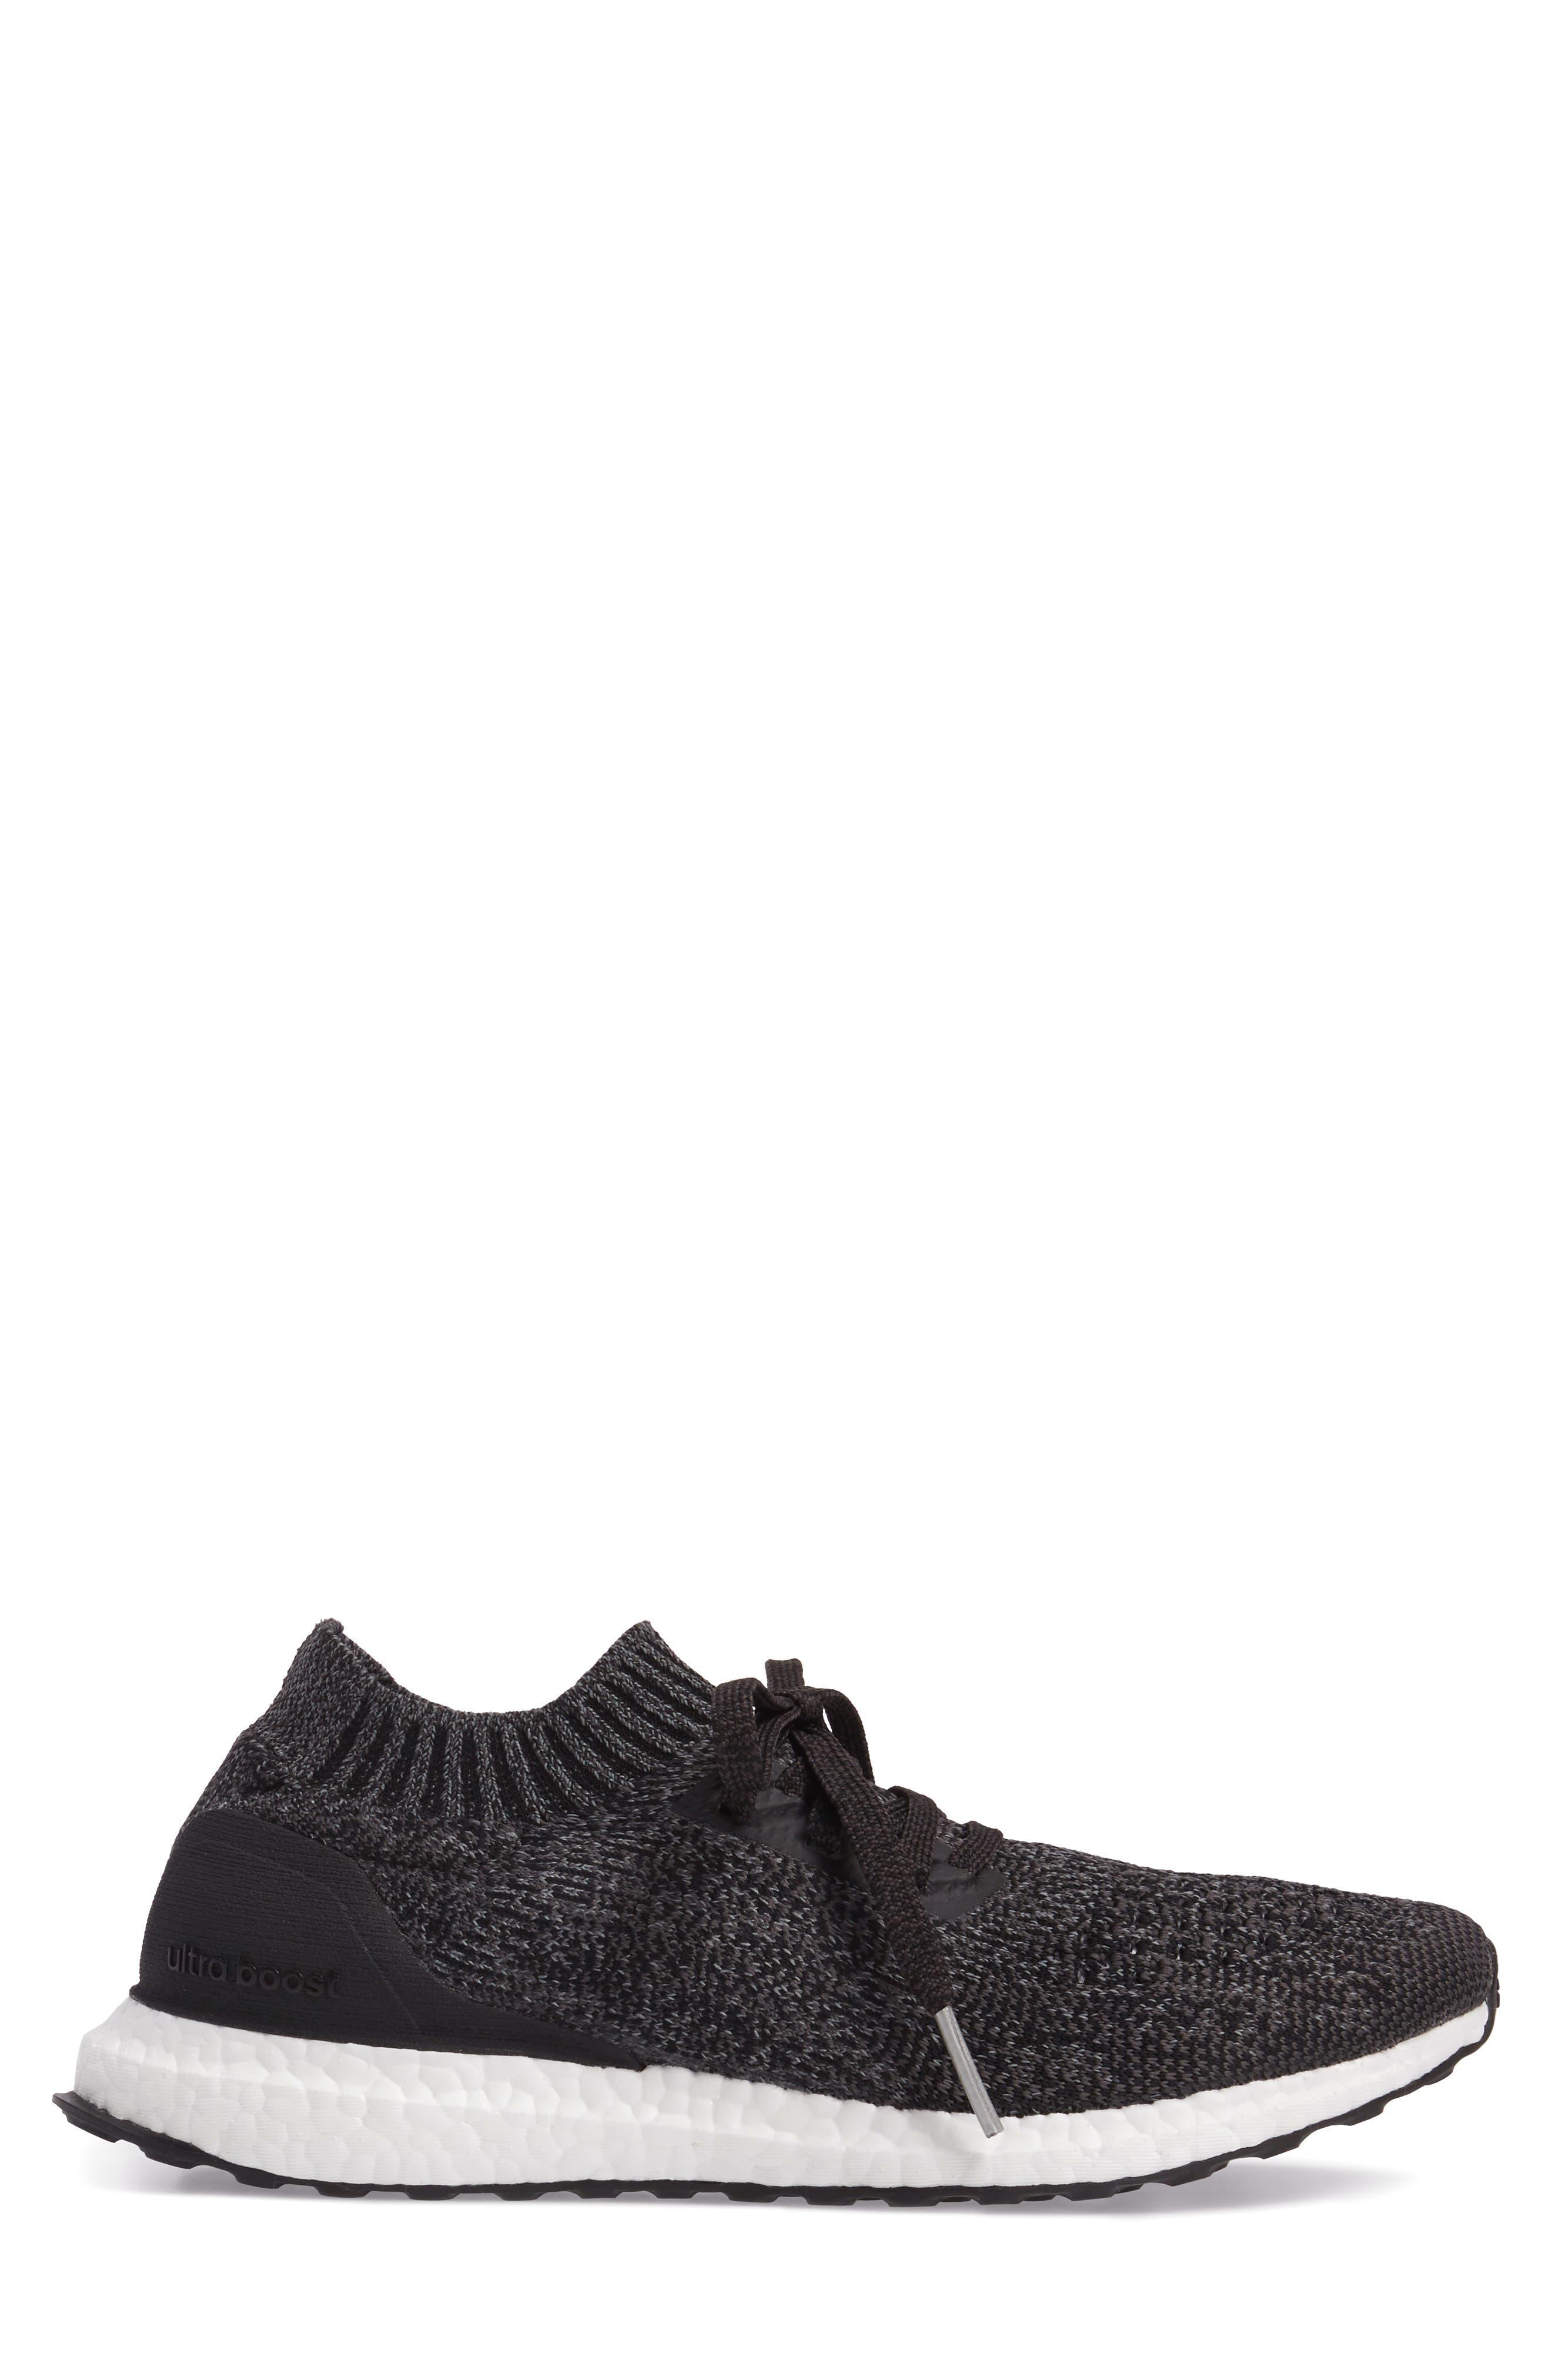 Alternate Image 3  - adidas 'UltraBOOST Uncaged' Running Shoe (Men)